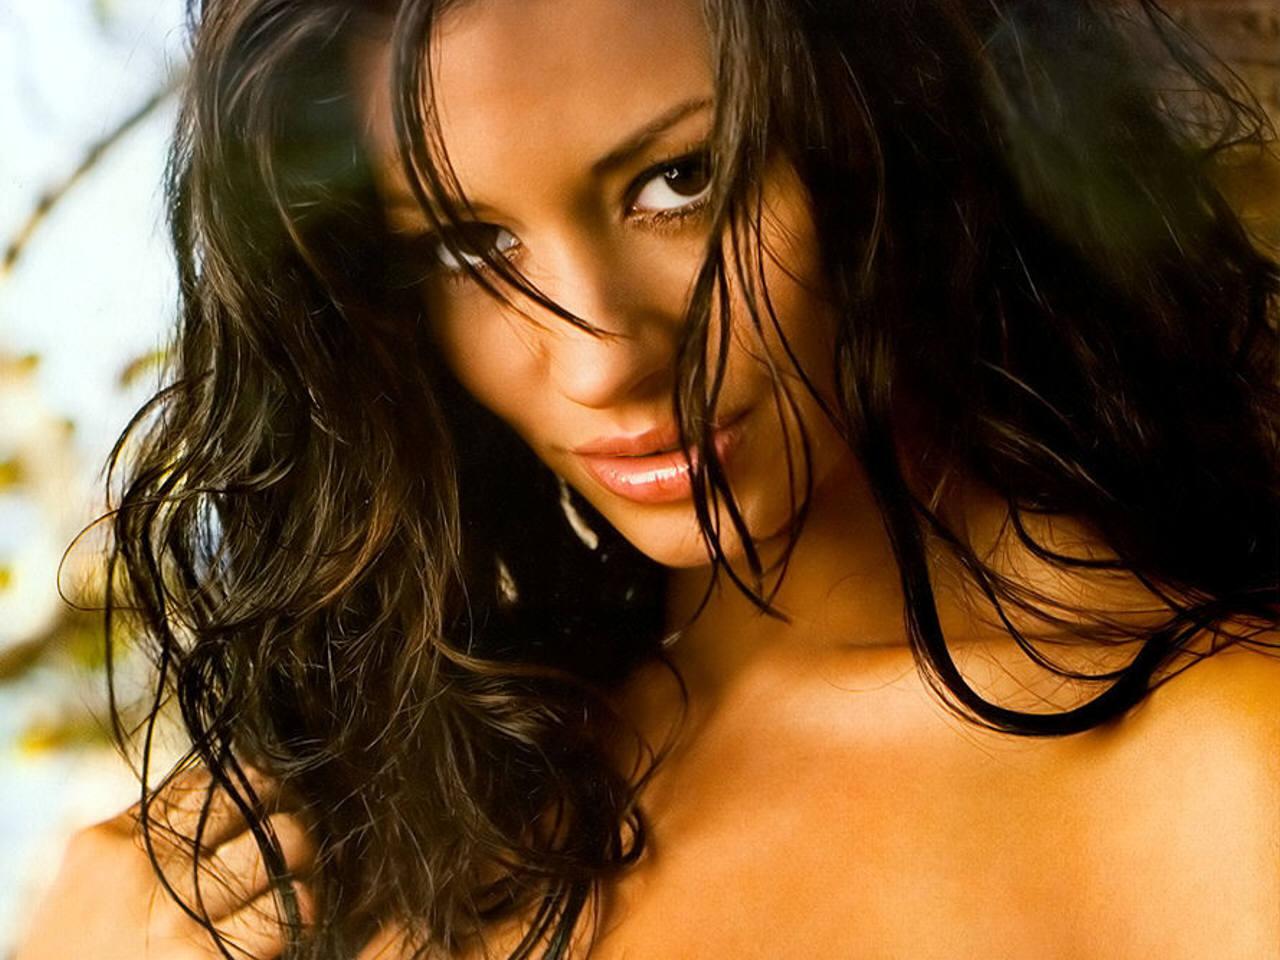 http://1.bp.blogspot.com/-KoJya3VzvmI/TmS8iOrR9nI/AAAAAAAABBA/H6_wR2vZfms/s1600/Hot+Candice+Michelle+Pictures+%252815%2529.jpg